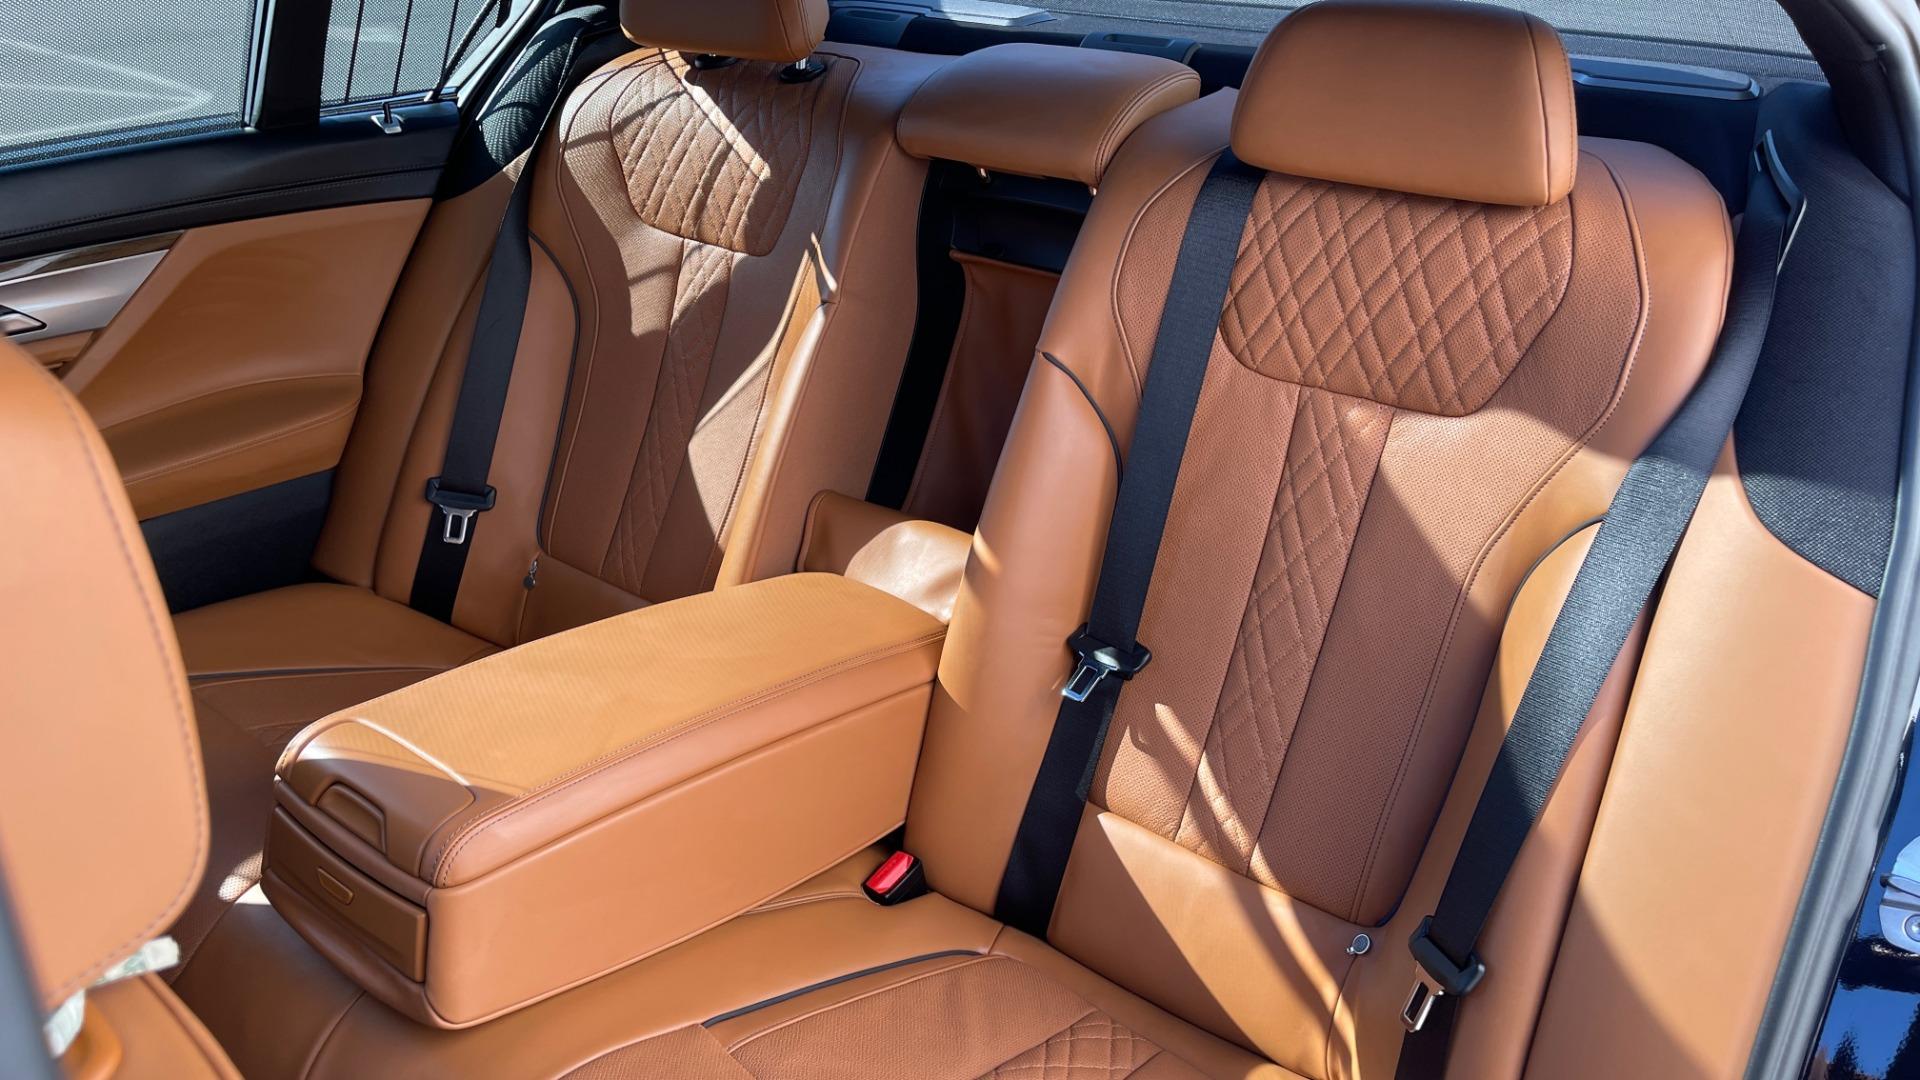 Used 2019 BMW 7 SERIES 750I XDRIVE M-SPORT / EXEC PKG / DRVR ASST PLUS / CLD WTHR / PAR for sale $60,995 at Formula Imports in Charlotte NC 28227 46